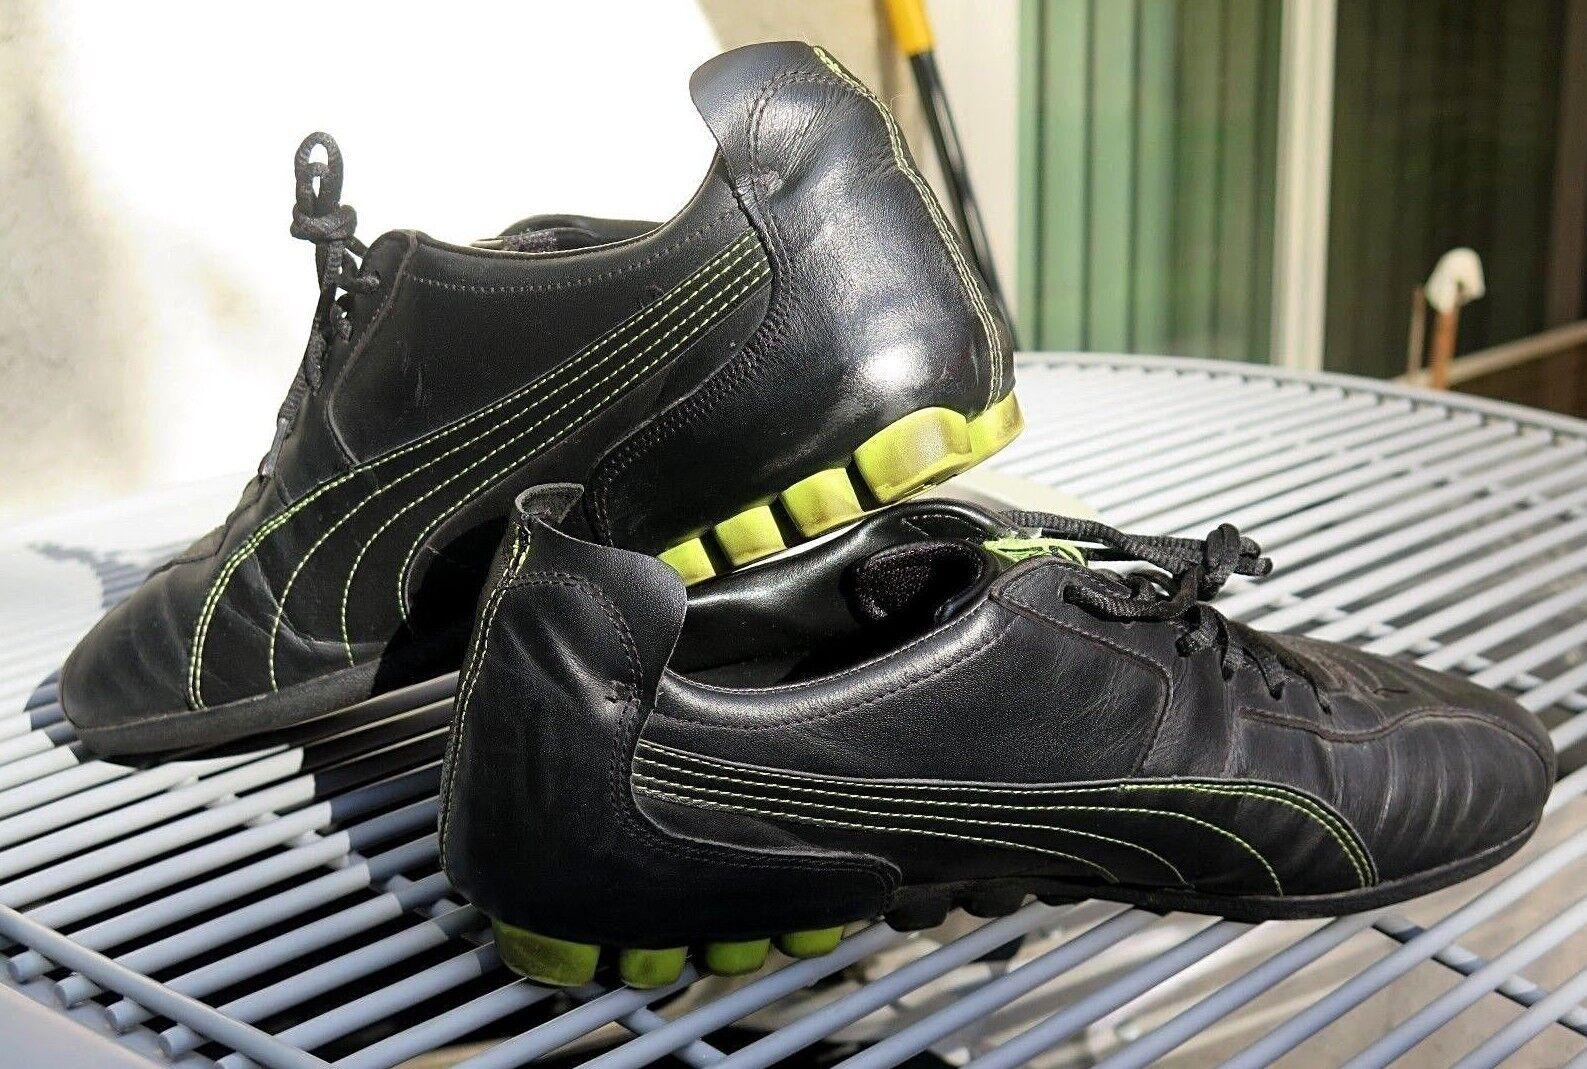 Euc noi sz 12 12 sz puma uomini di pelle di scarpe casual scarpa da ginnastica di colore lime b63030